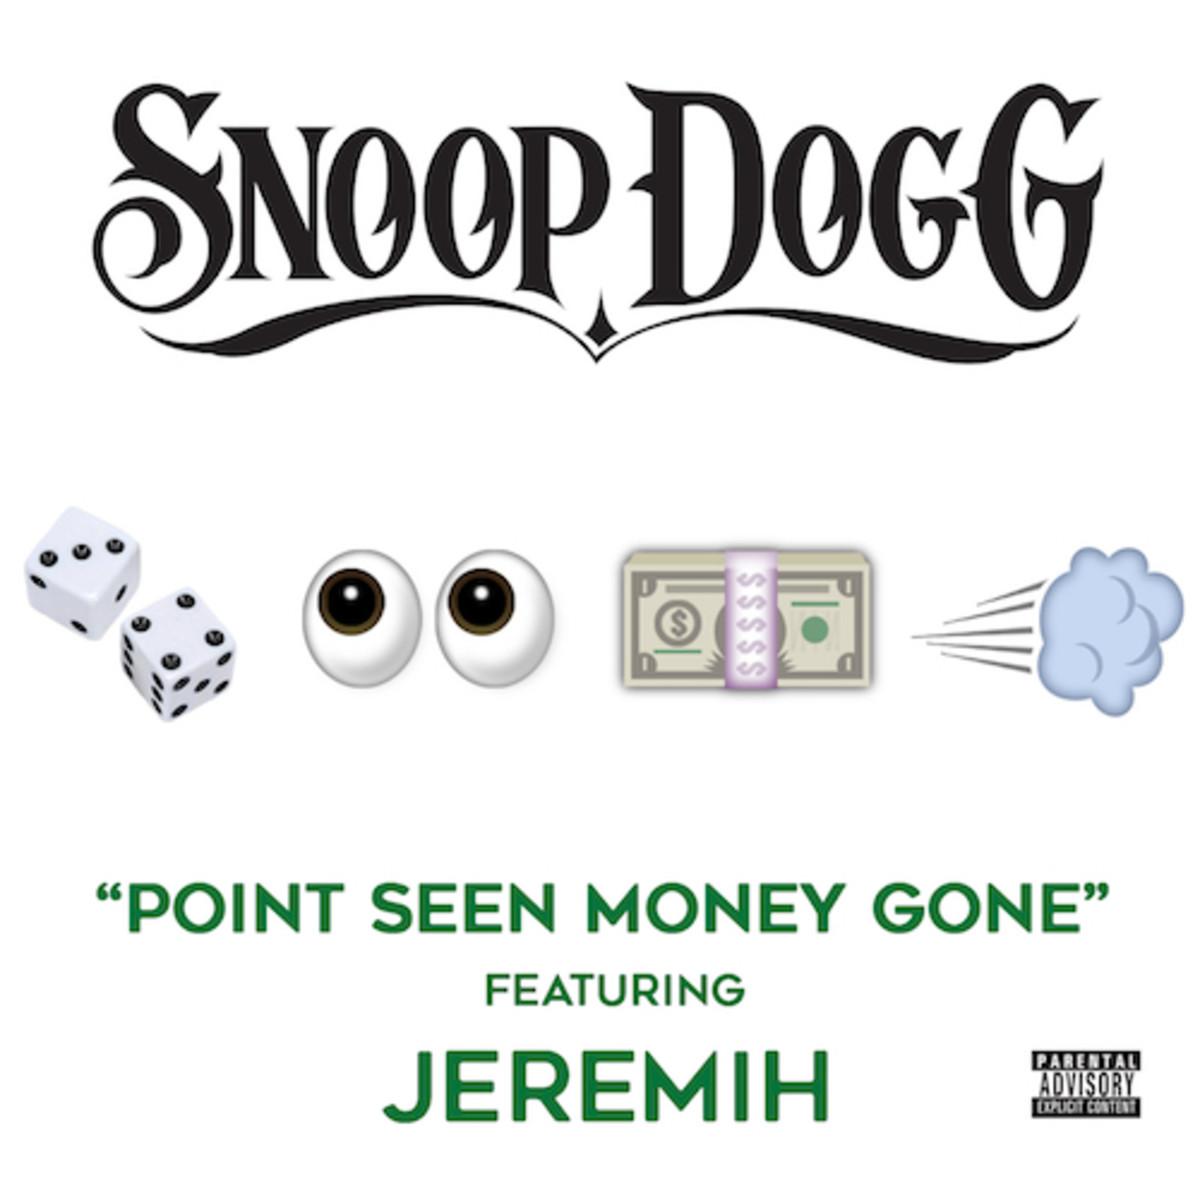 snoop-dogg-point-seen-money-gone.jpg